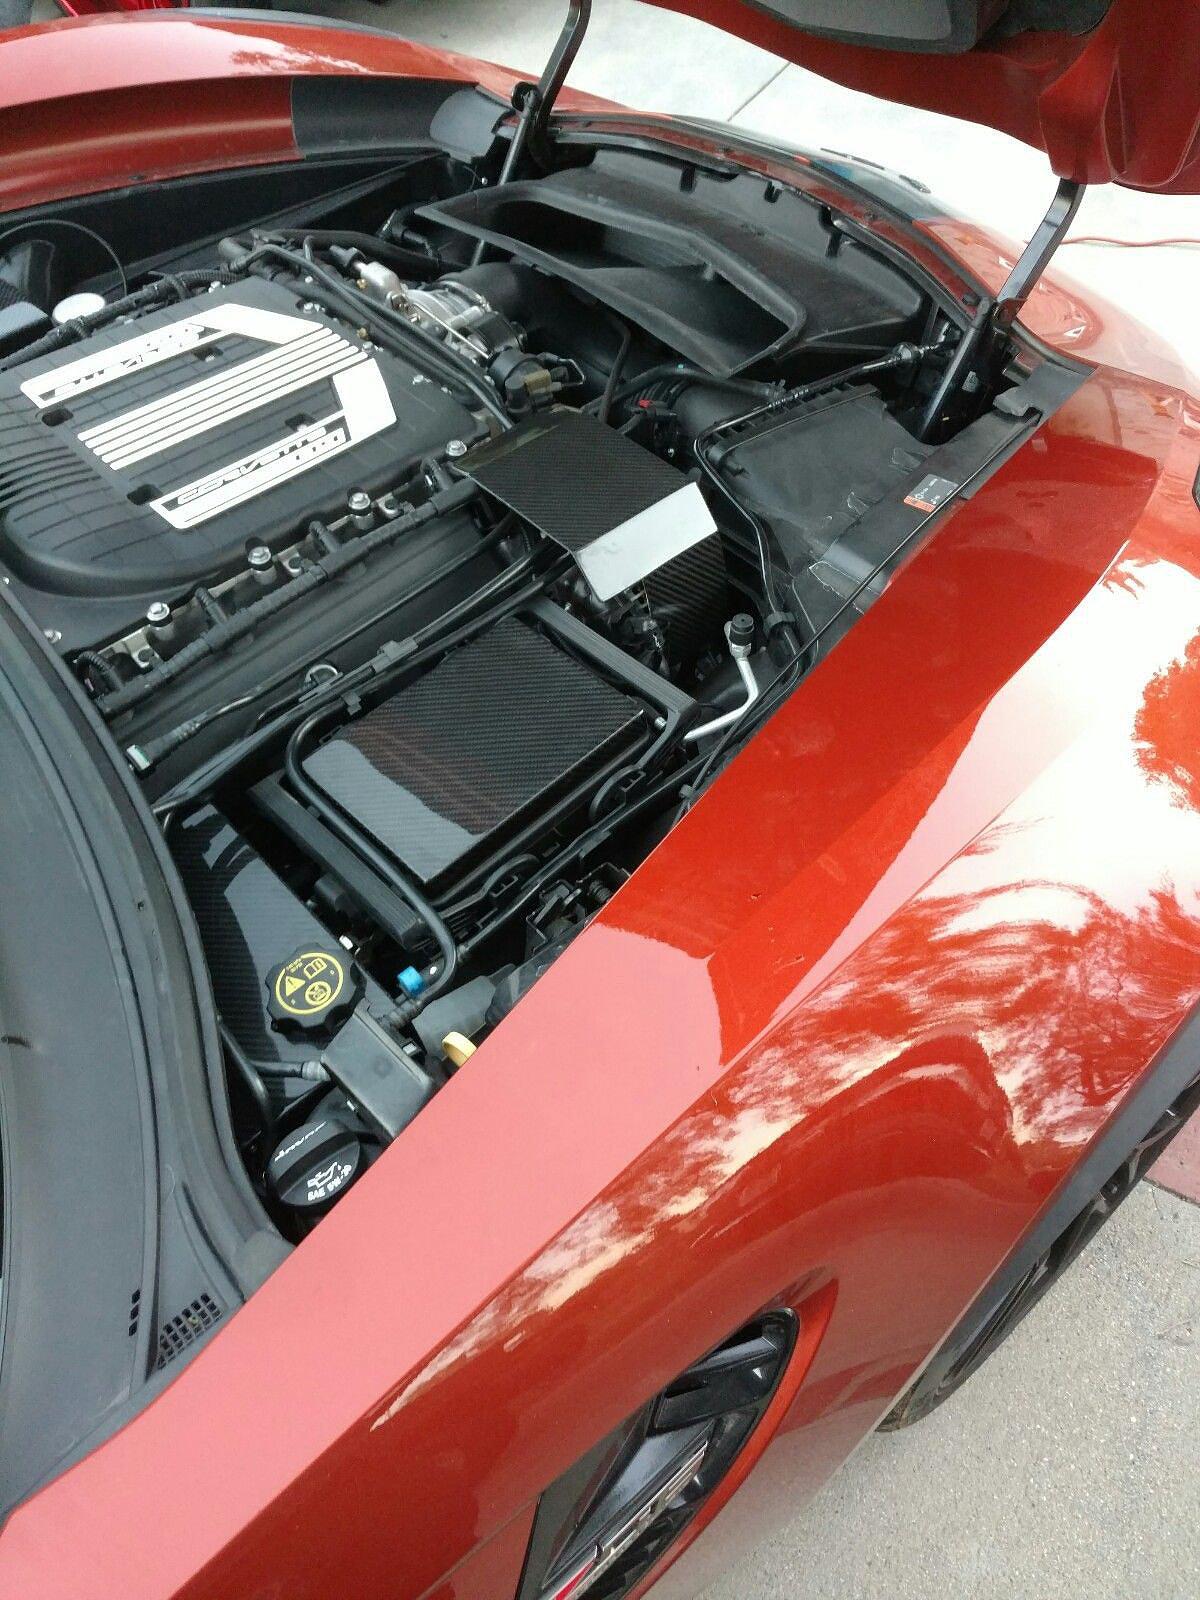 WRG-4669] C7 Corvette Fuse Box Picture